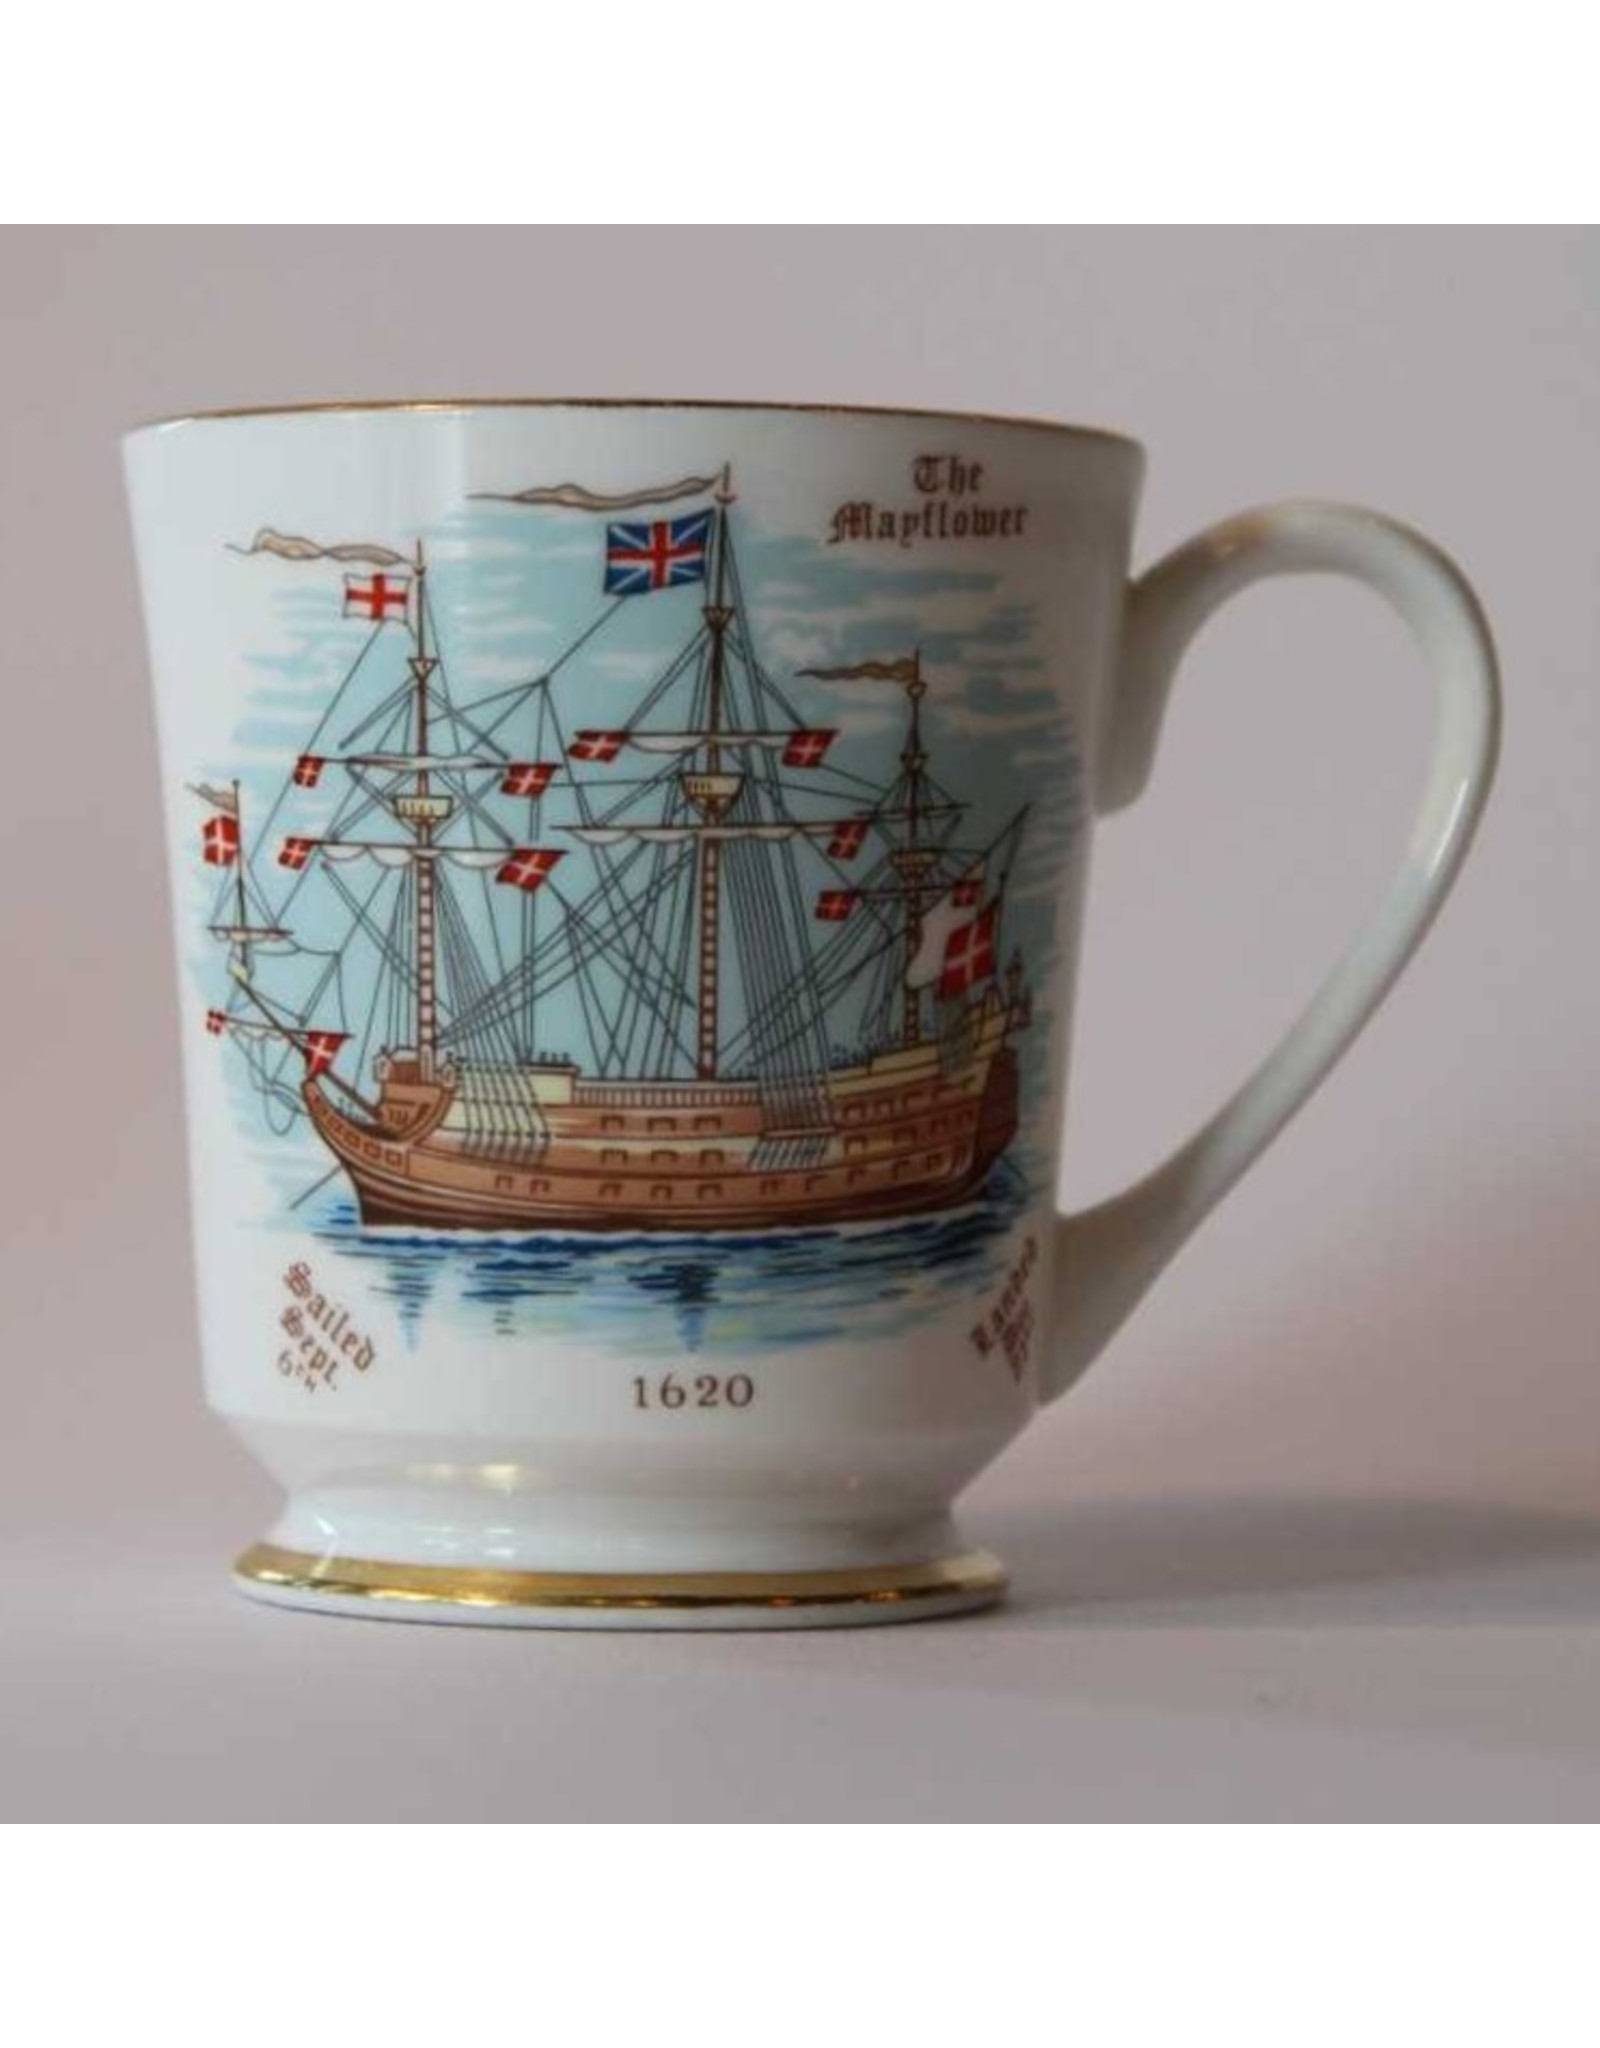 Mug - Aynsley porcelain Mayflower 350th Anniversary Commemorative